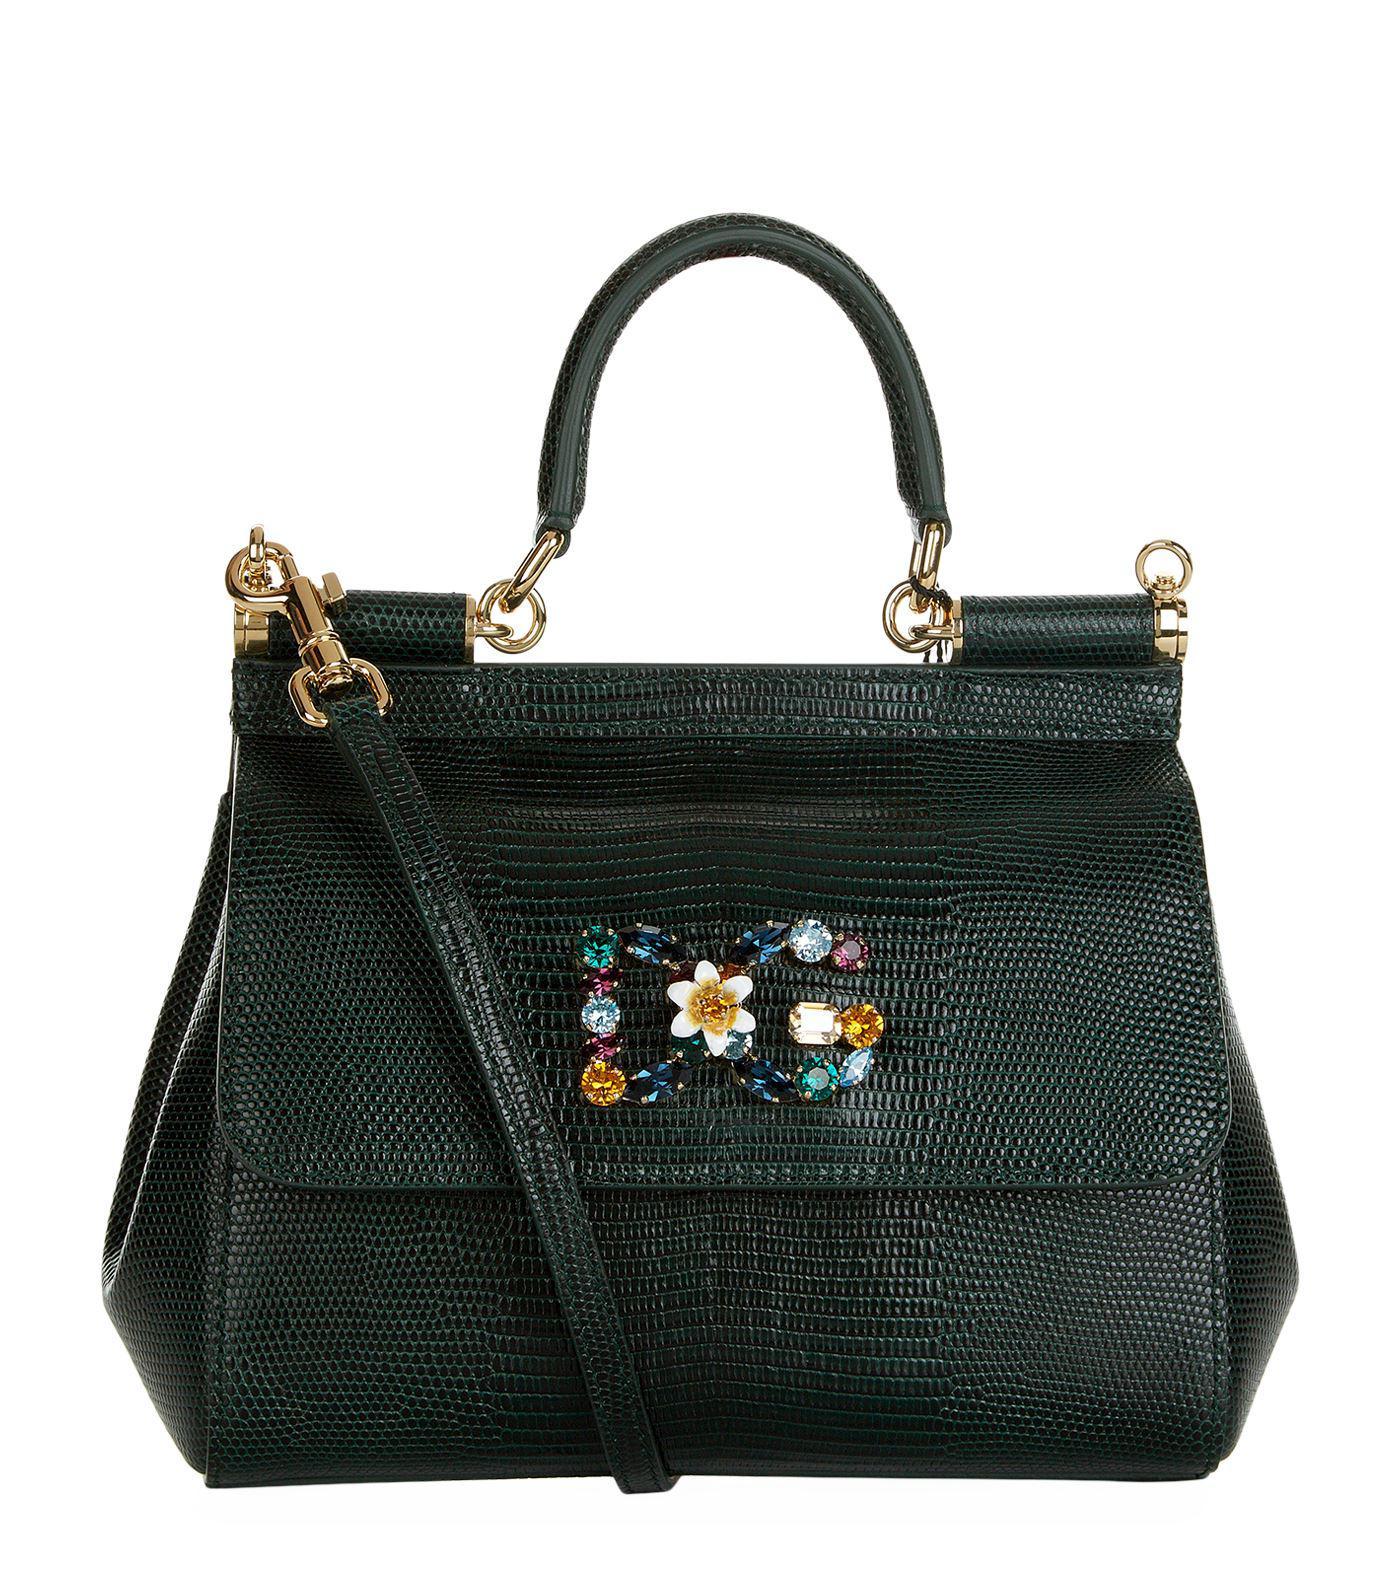 92154cf9b663 Dolce   Gabbana. Women s Black Small Leather Iguana Print Sicily Bag